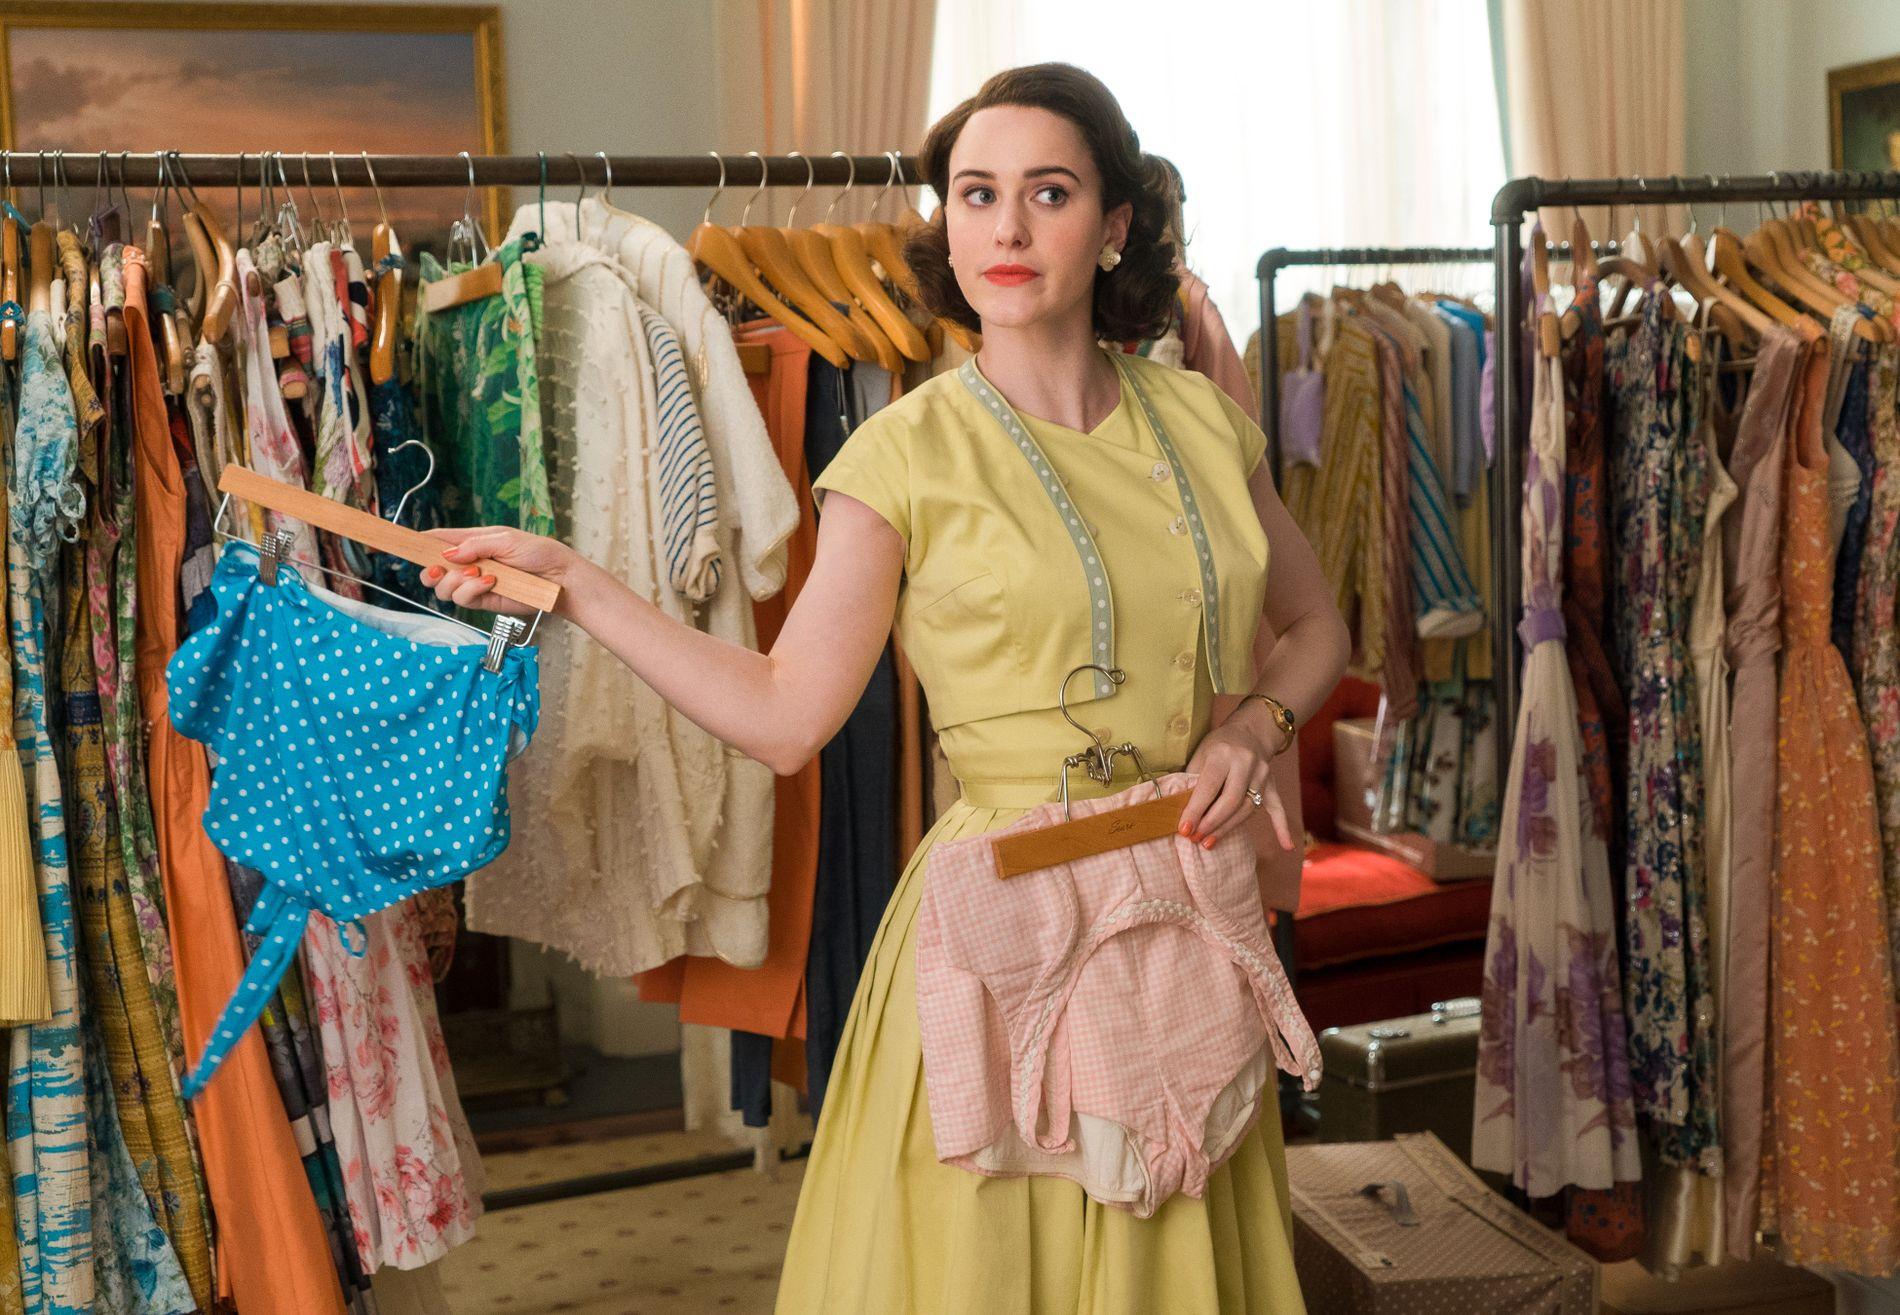 KOMIKER: Rachel Brosnahan som Miriam «Midge» Maisel.